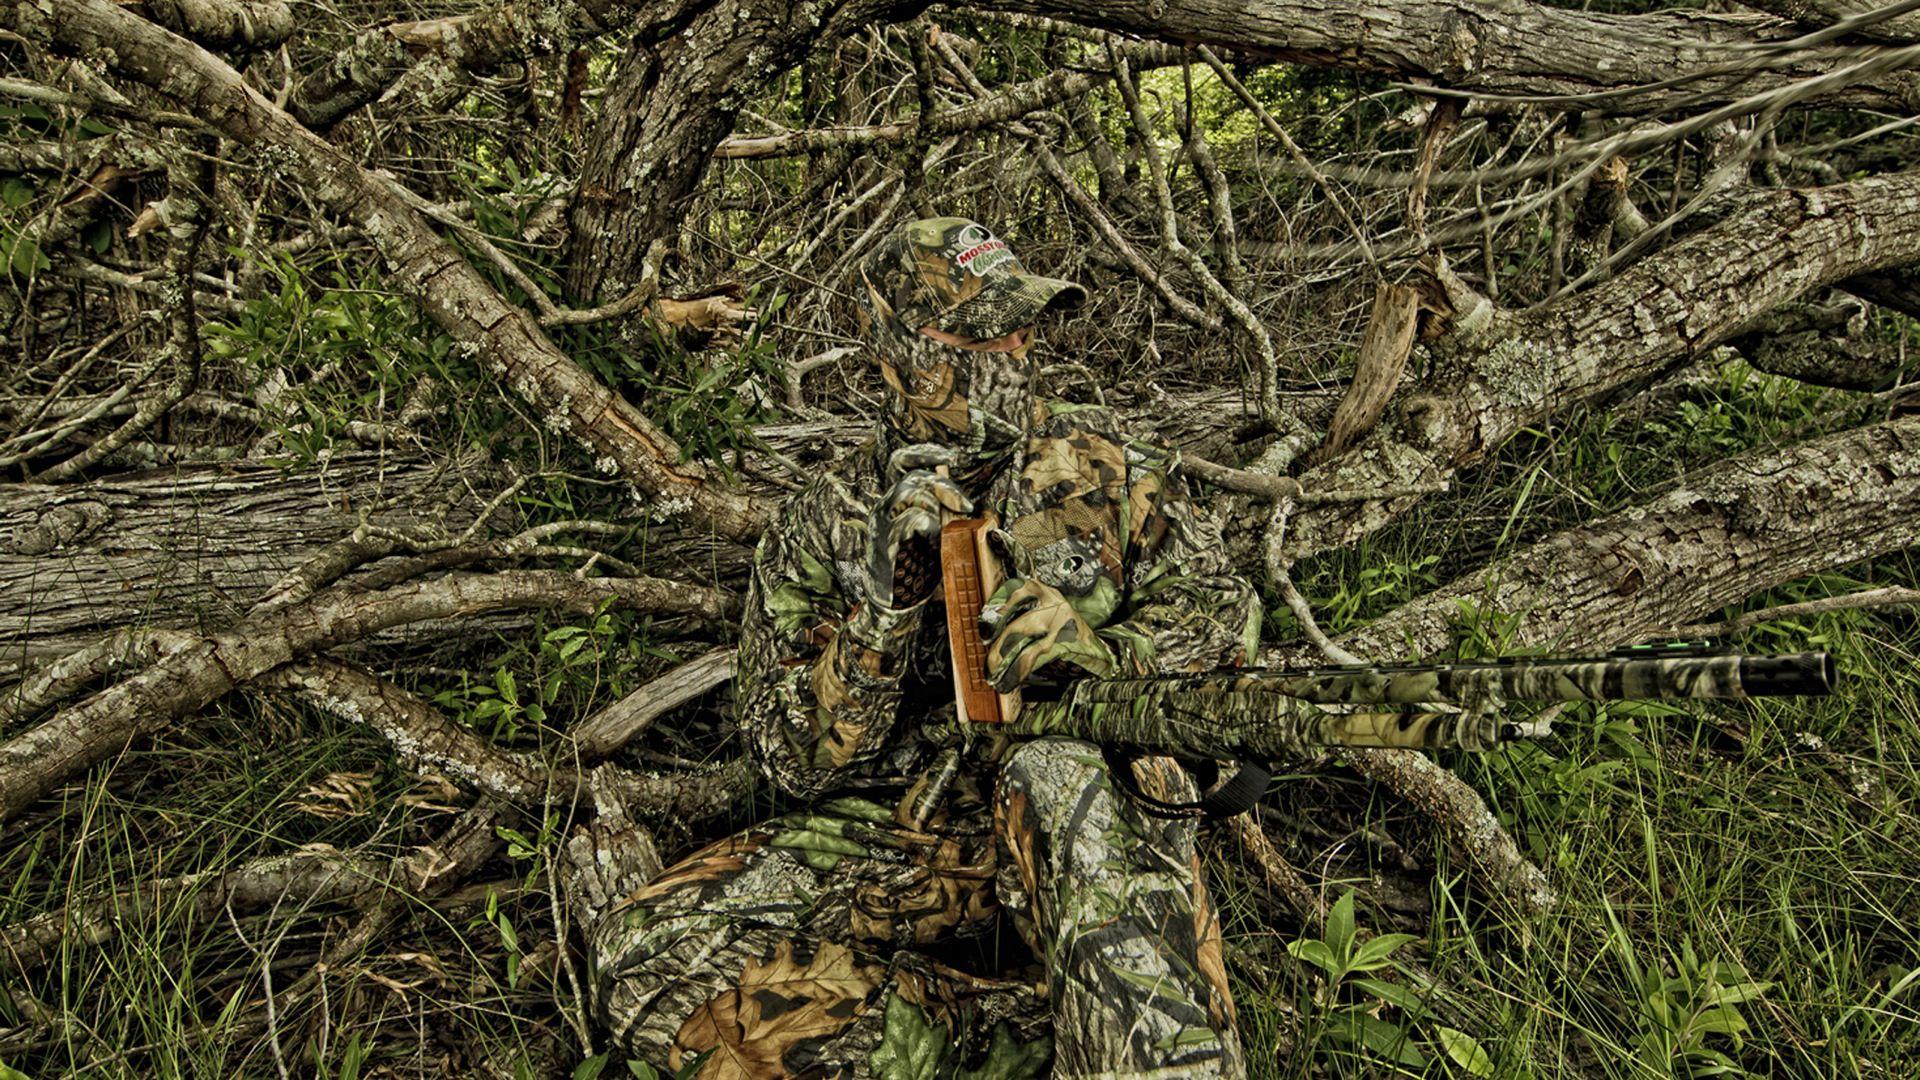 Spring Turkey Hunting Wallpaper - WallpaperSafari